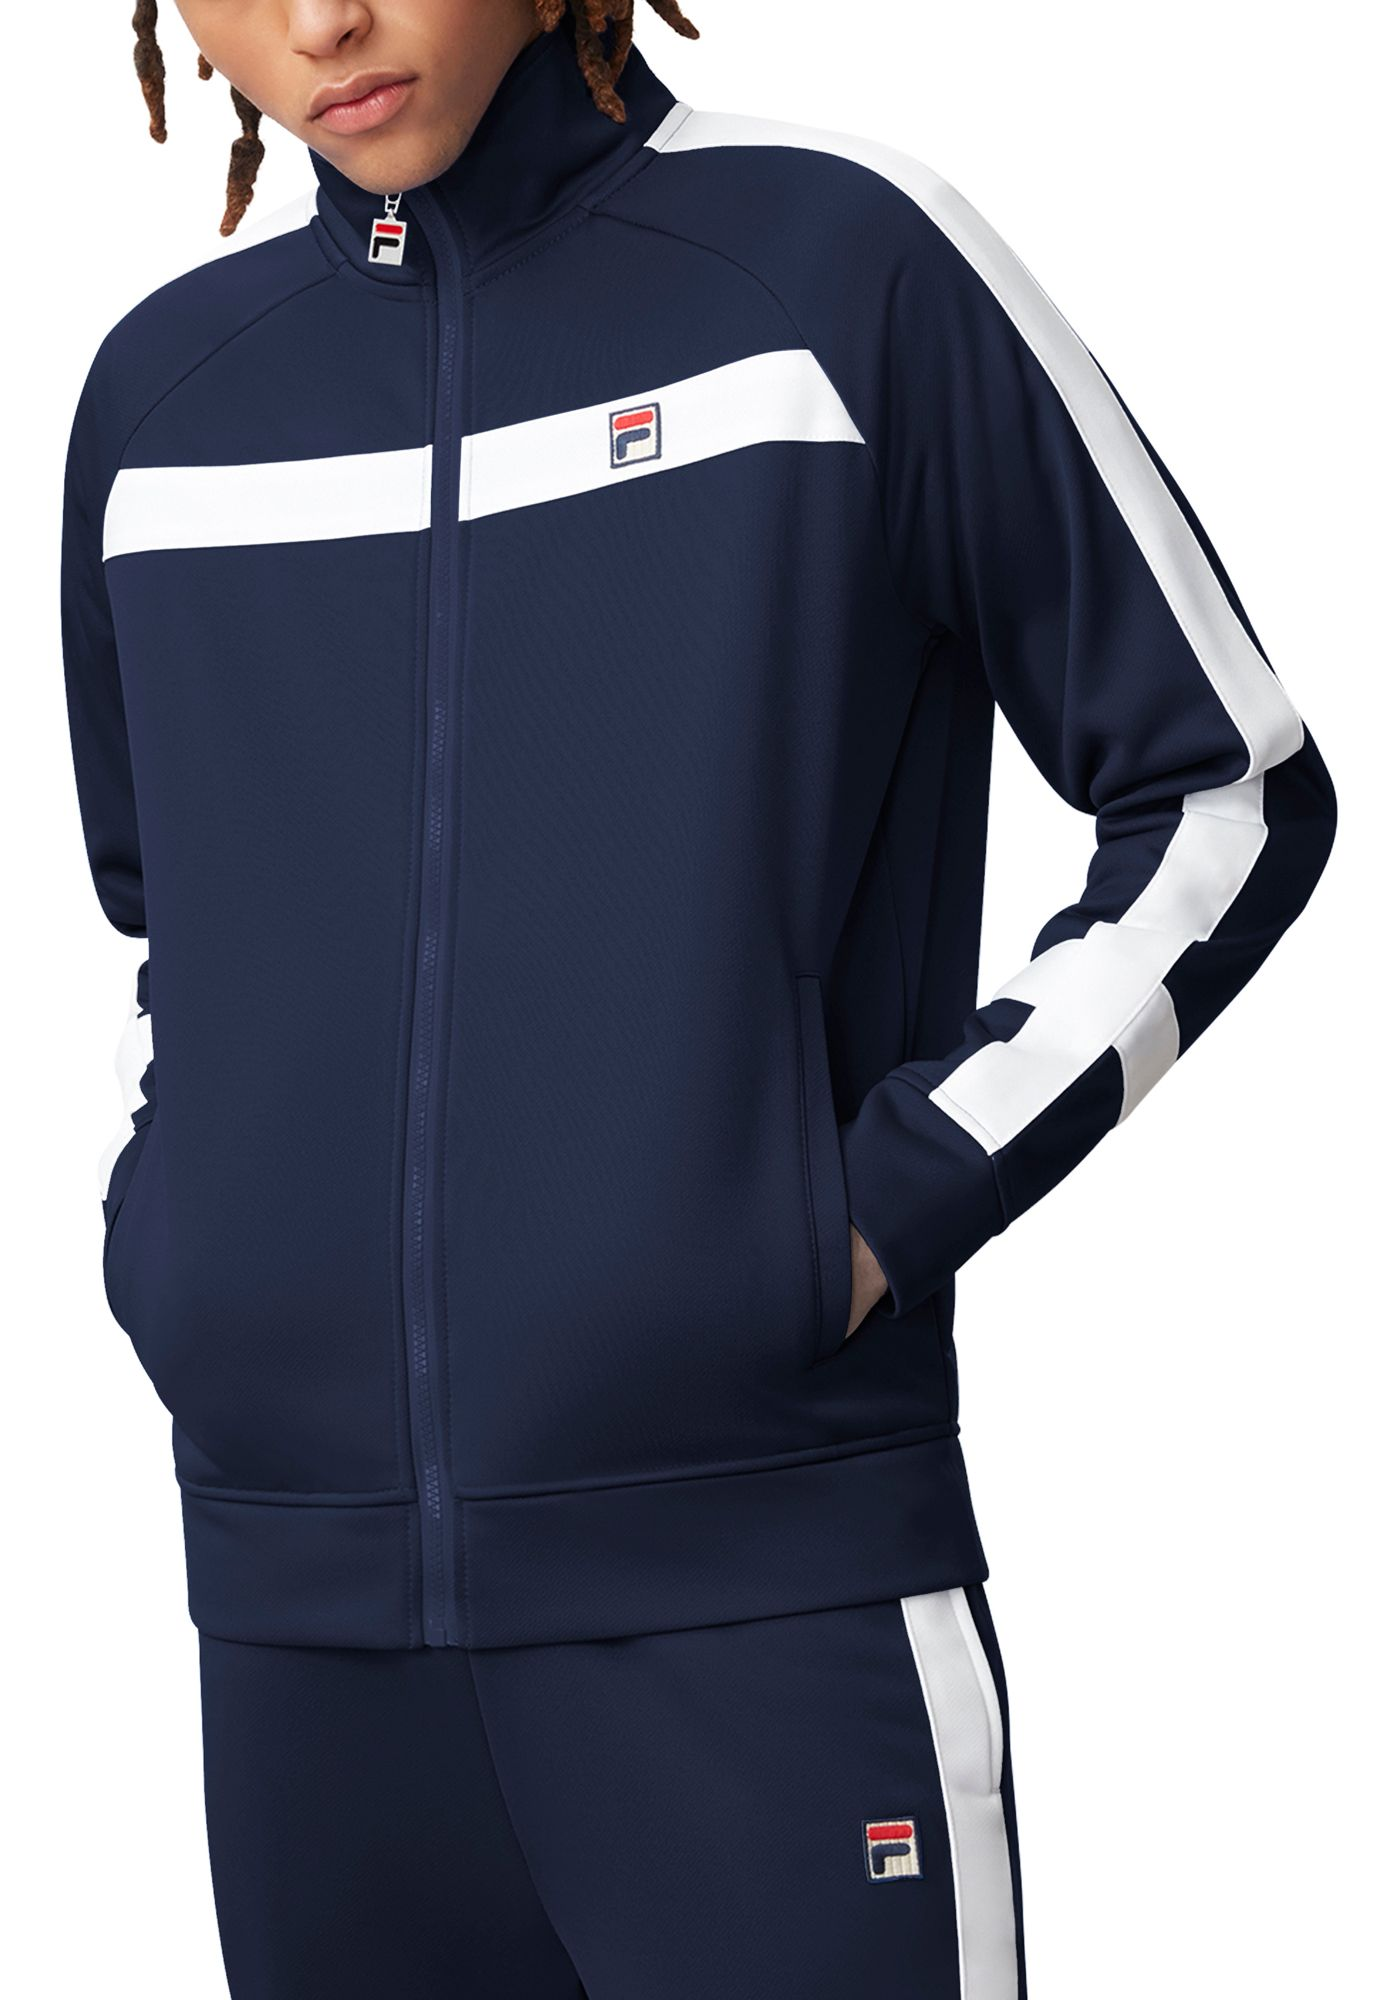 FILA Men's Renzo Track Jacket